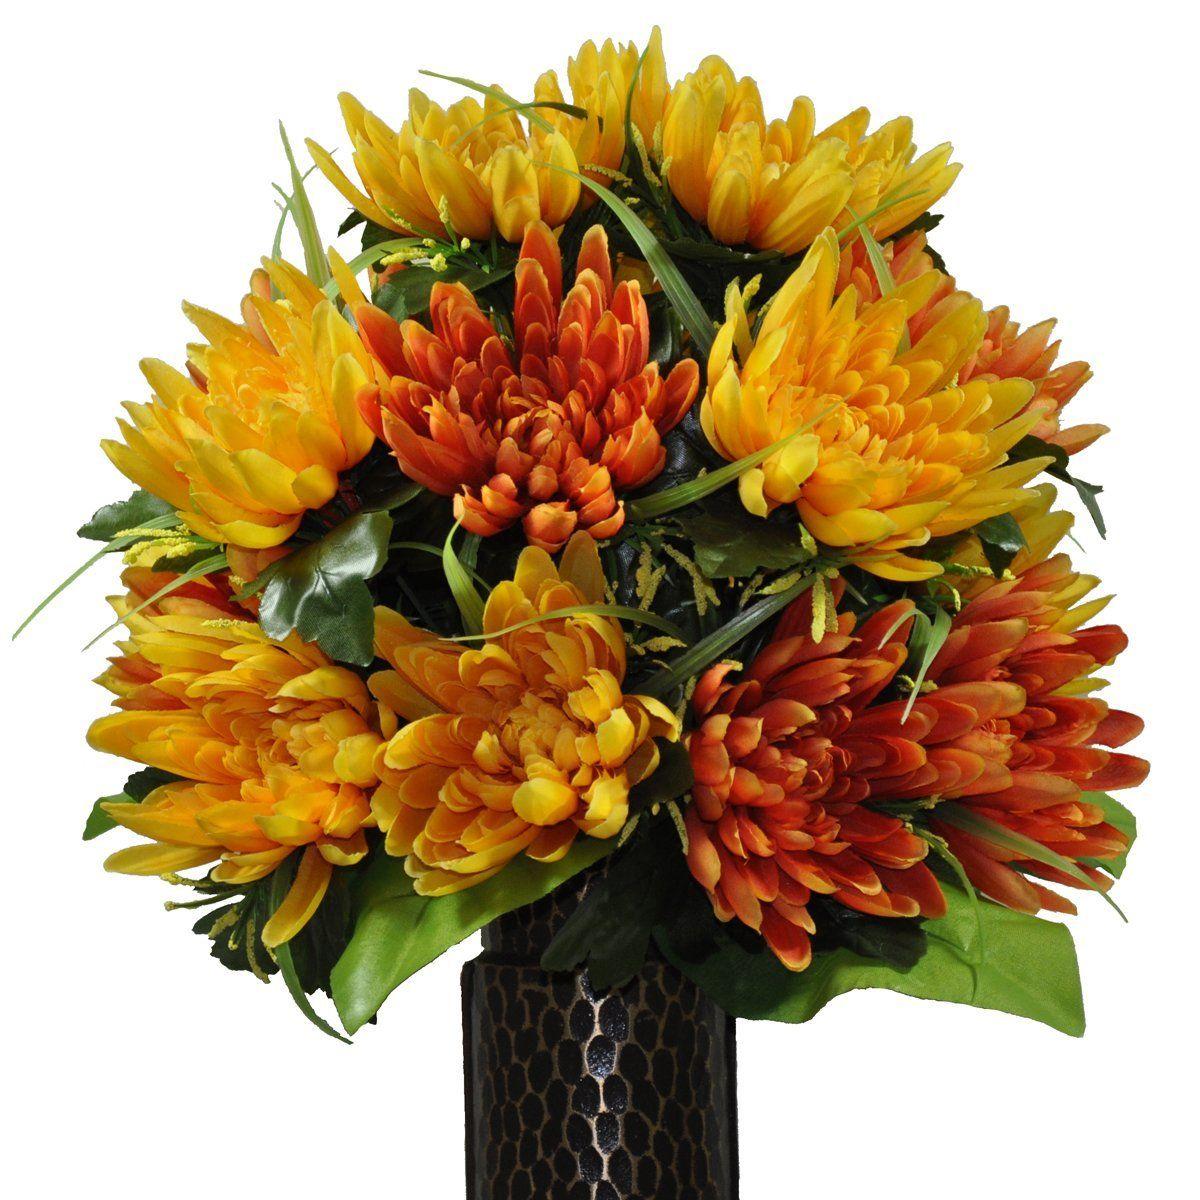 Orange fuji mum silk flower bouquet with stay in the vase design orange fuji mum silk flower bouquet with stay in the vase design reviewsmspy